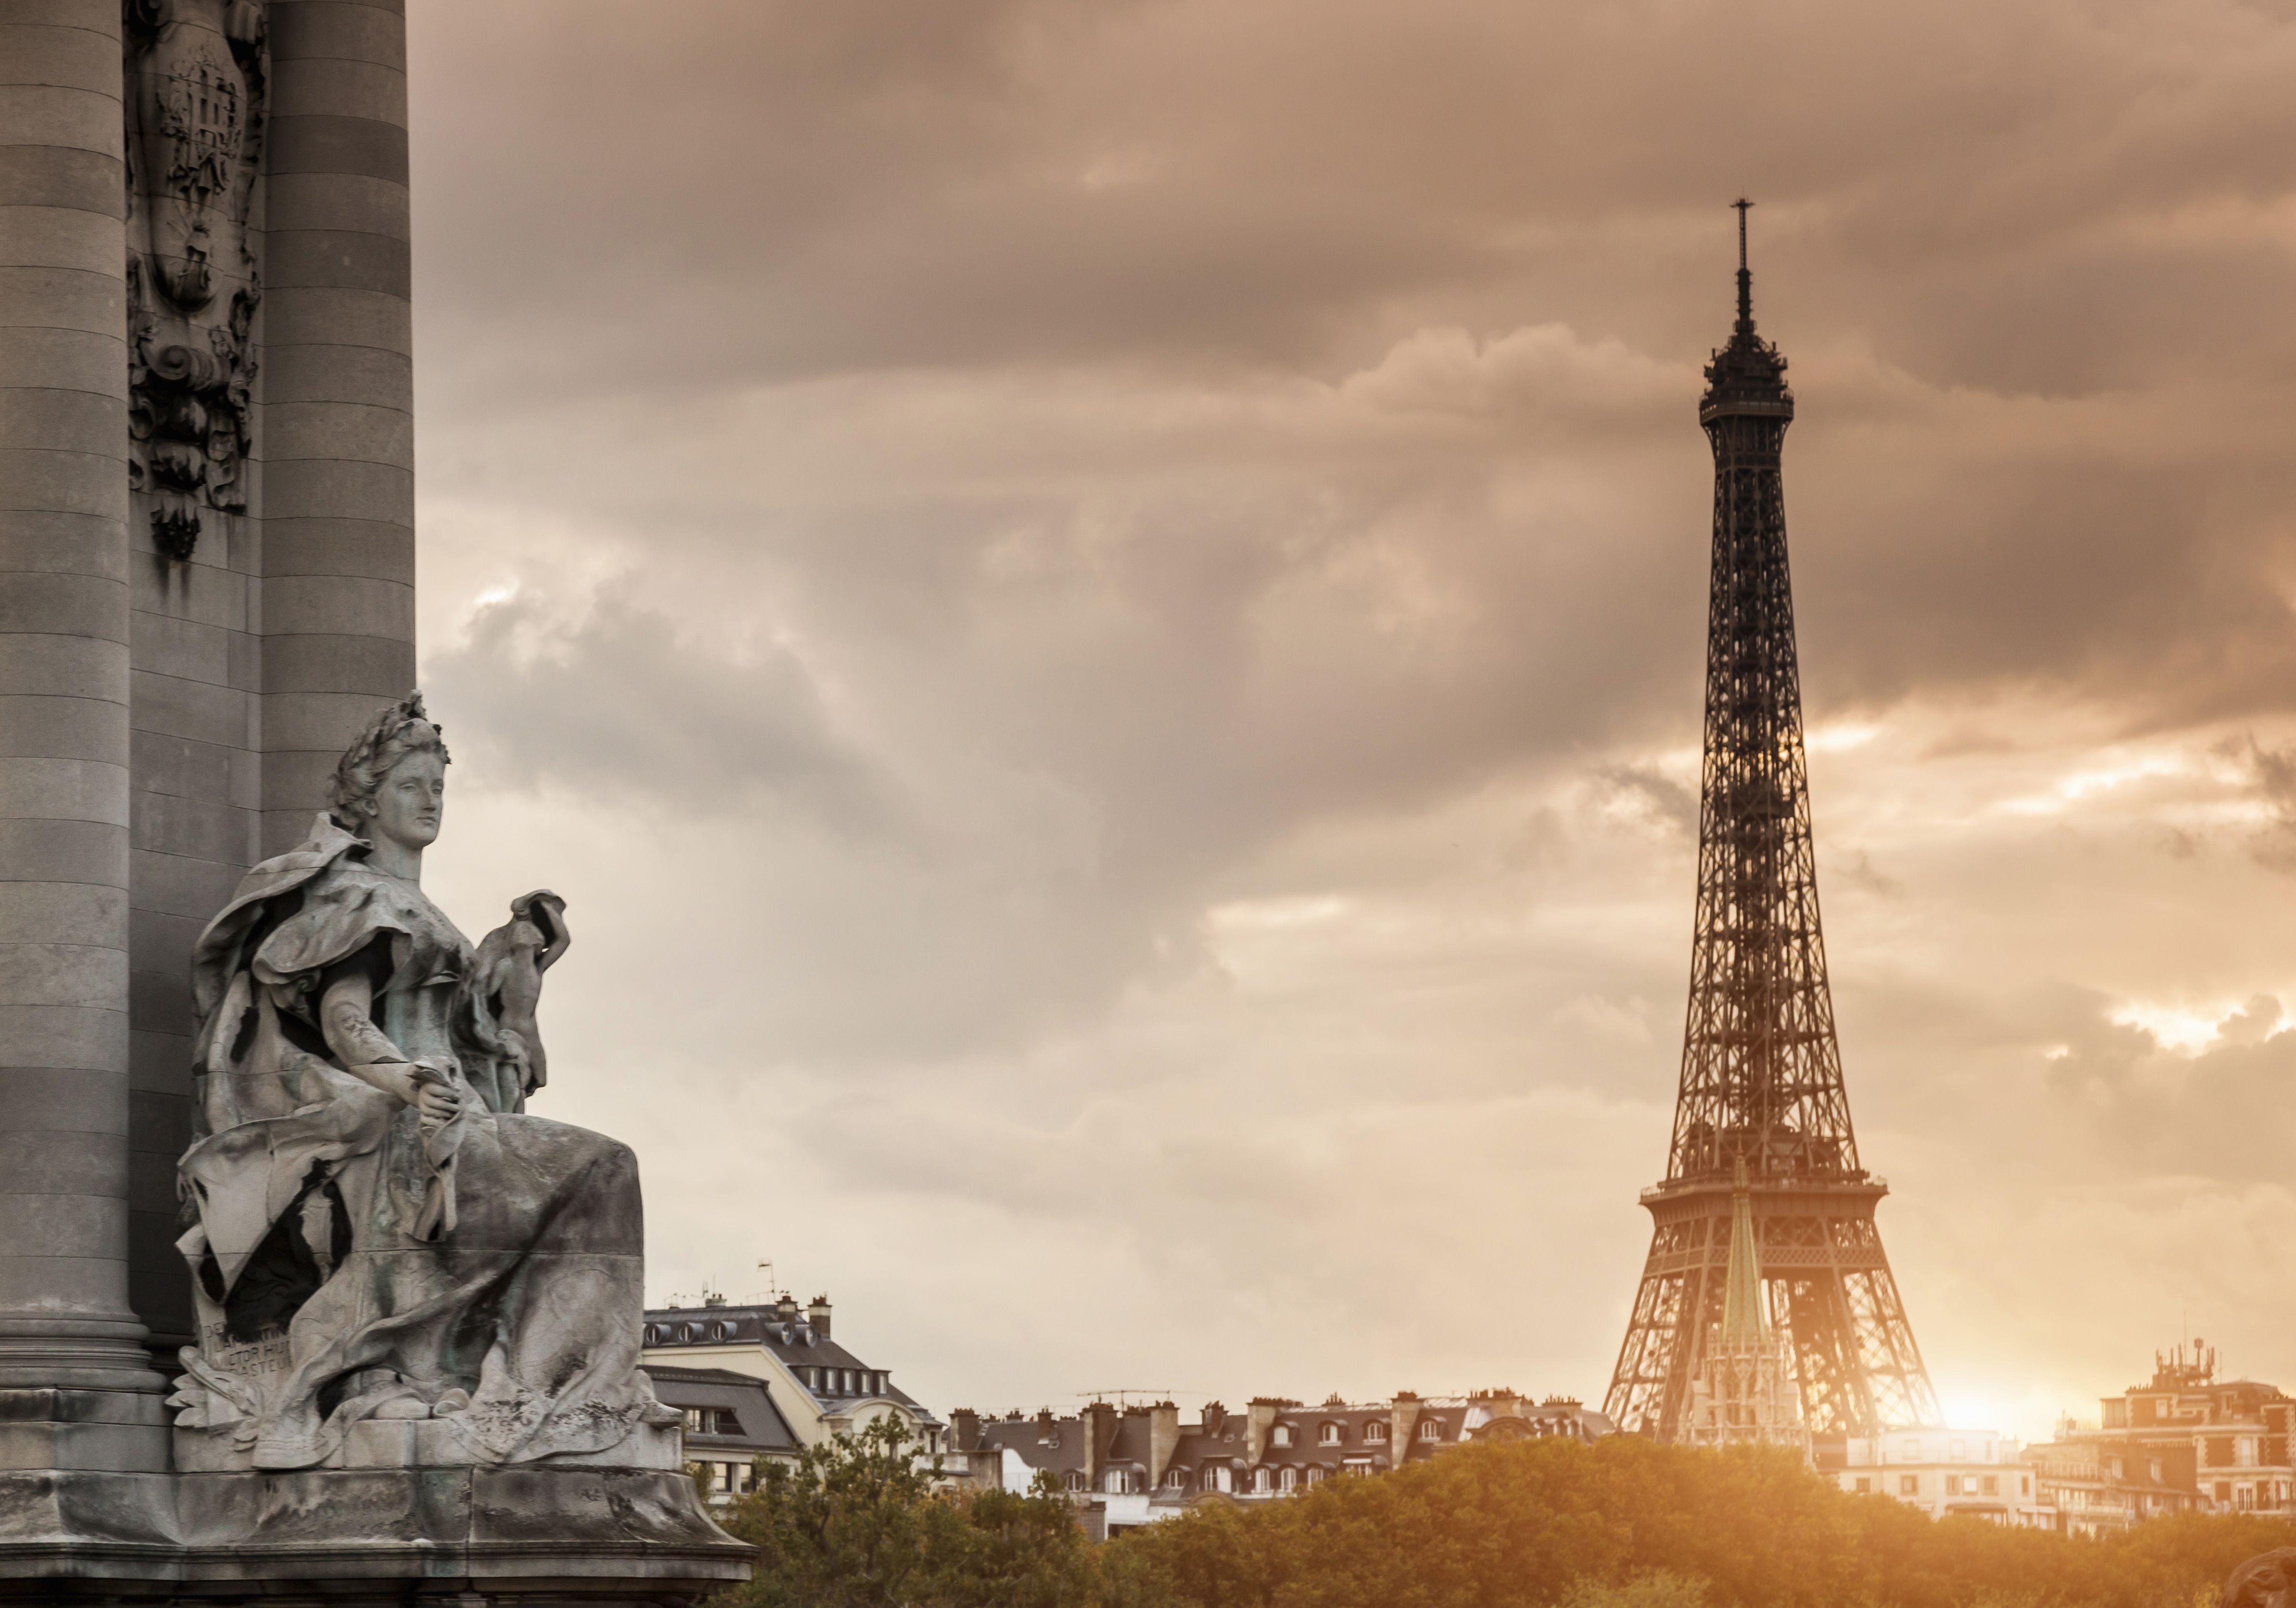 Minimum usage fee is £35Mandatory Credit: Photo by Cultura/REX/Shutterstock (4605418a)Sculpture on Pont Alexandre III bridge and Eiffel Tower, Paris, FranceVARIOUS